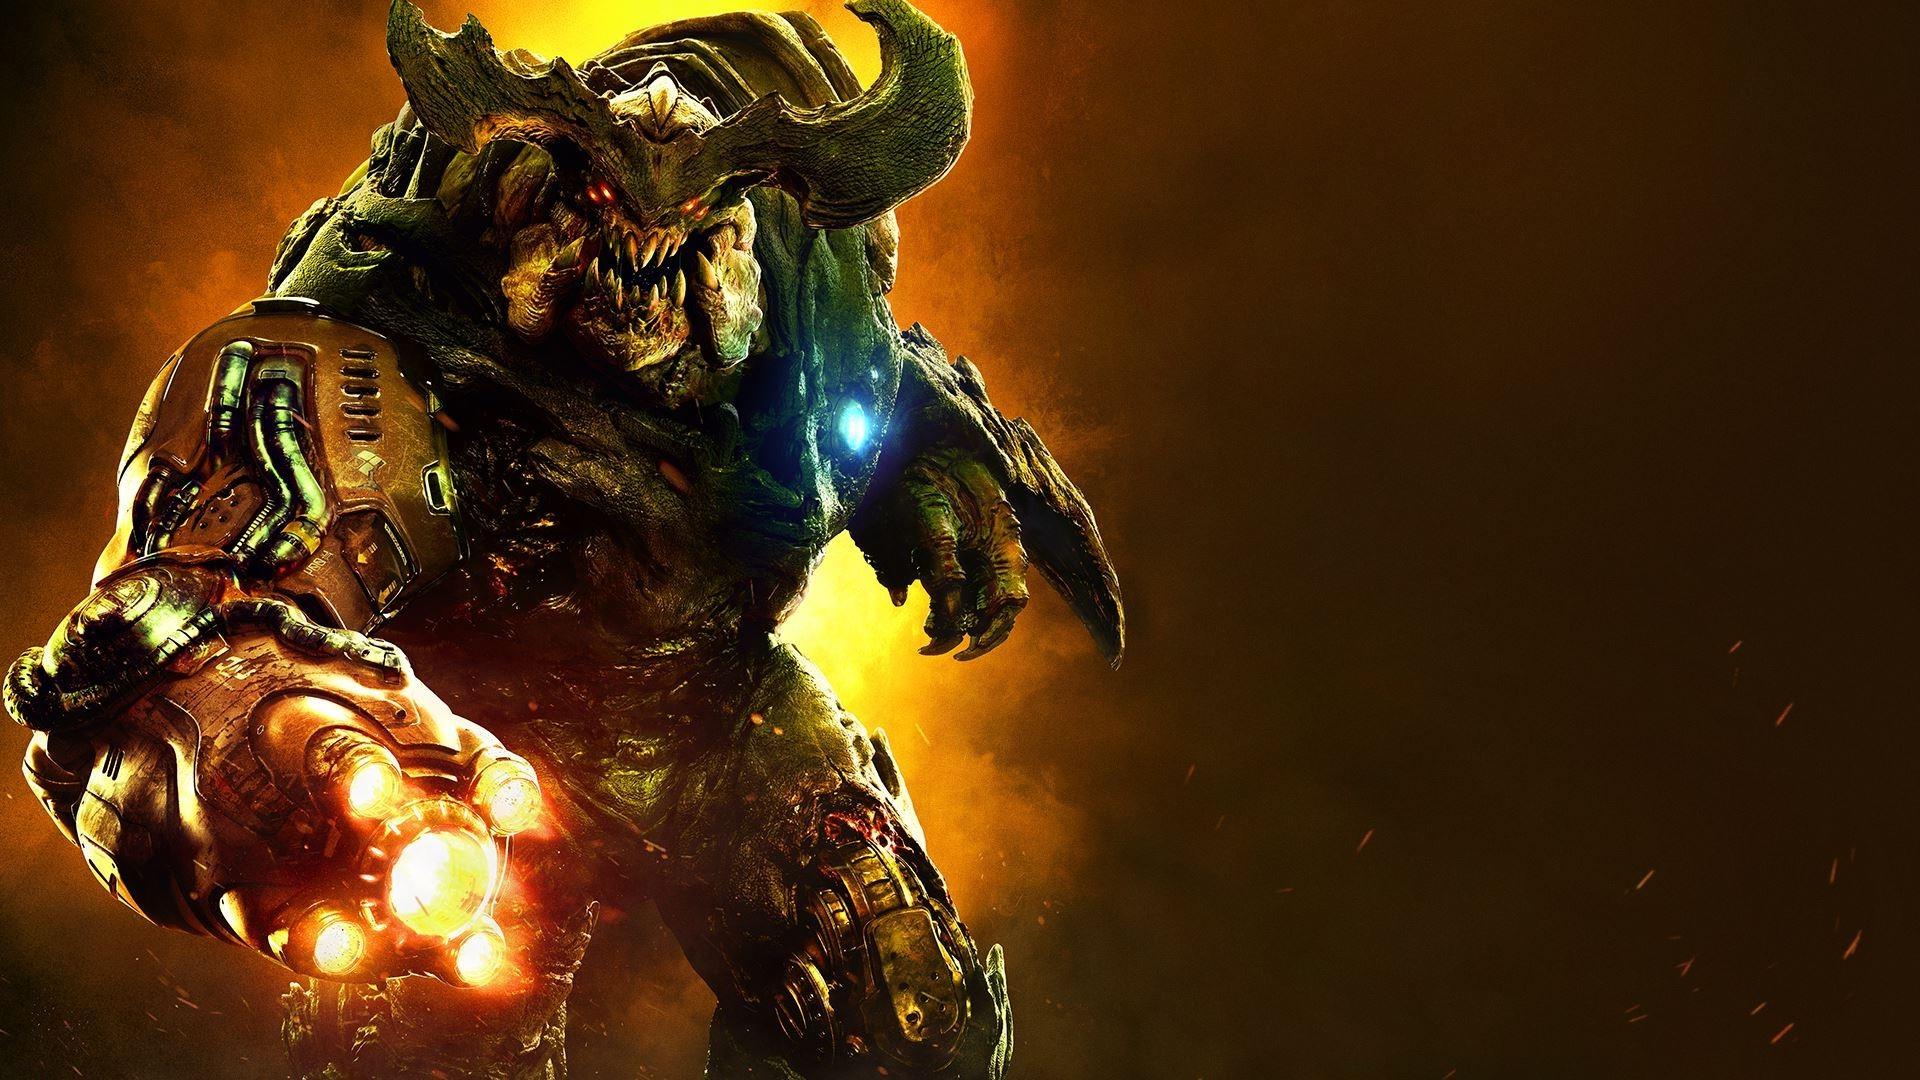 Fondos De Pantalla Videojuegos Obra De Arte Doom 4 Doom